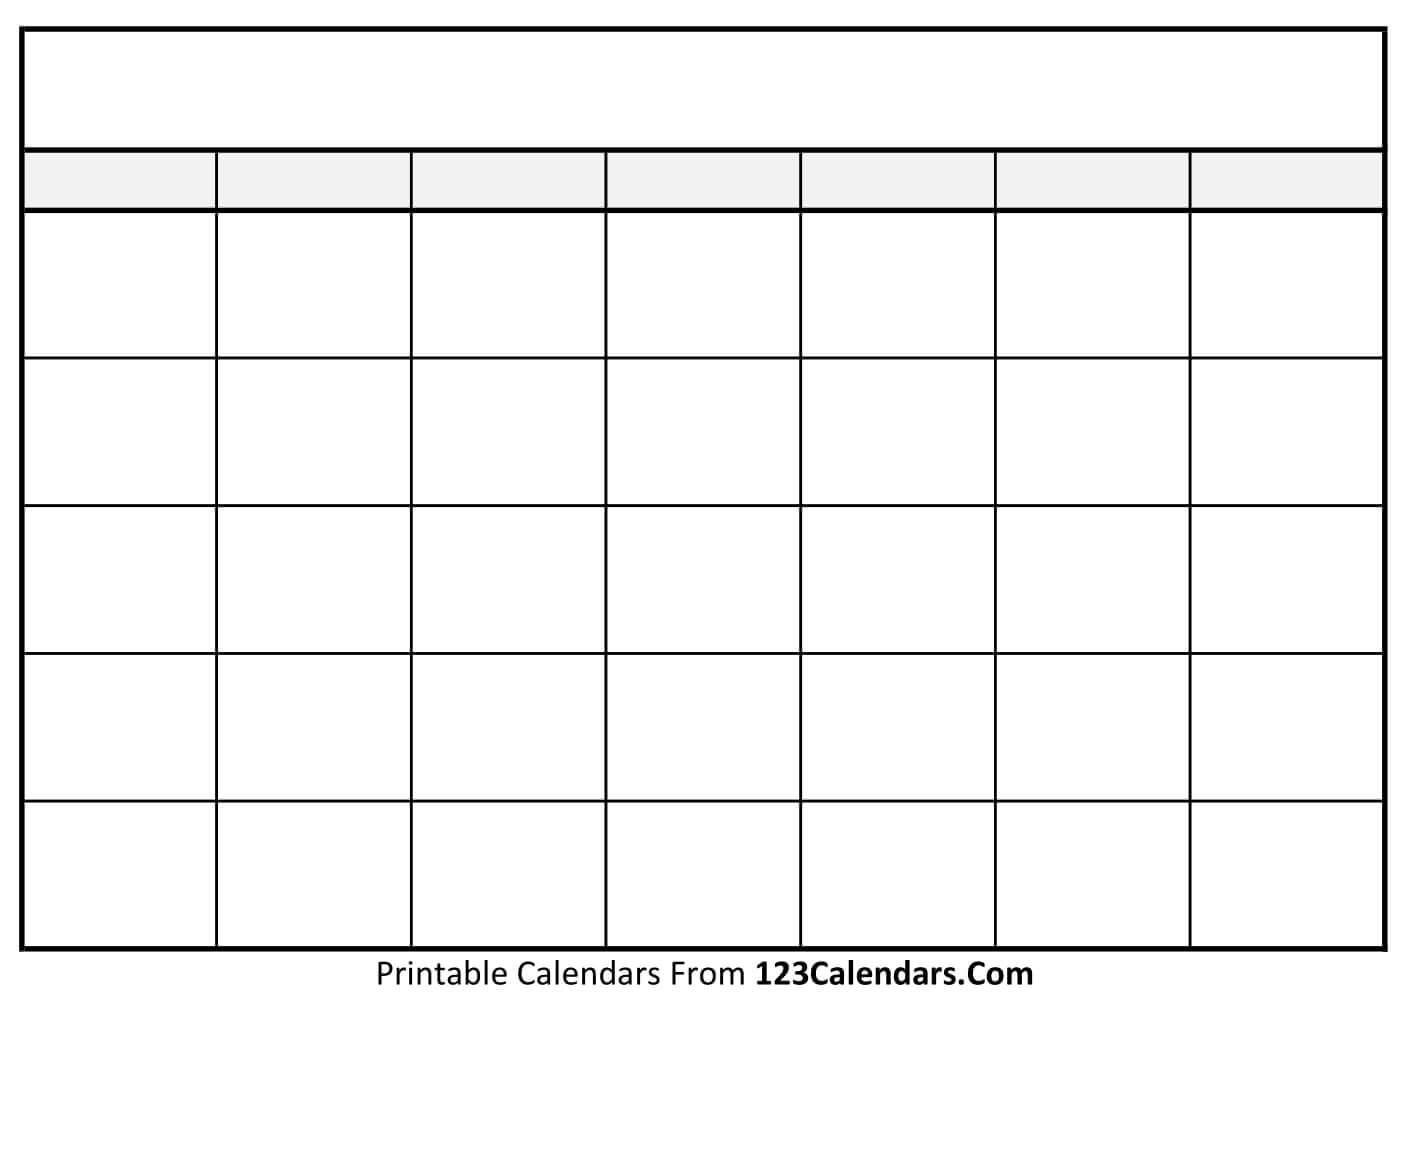 Print Blank Calendar - Wpa.wpart.co-Free Blank Printable Calendar Template 81/2X11